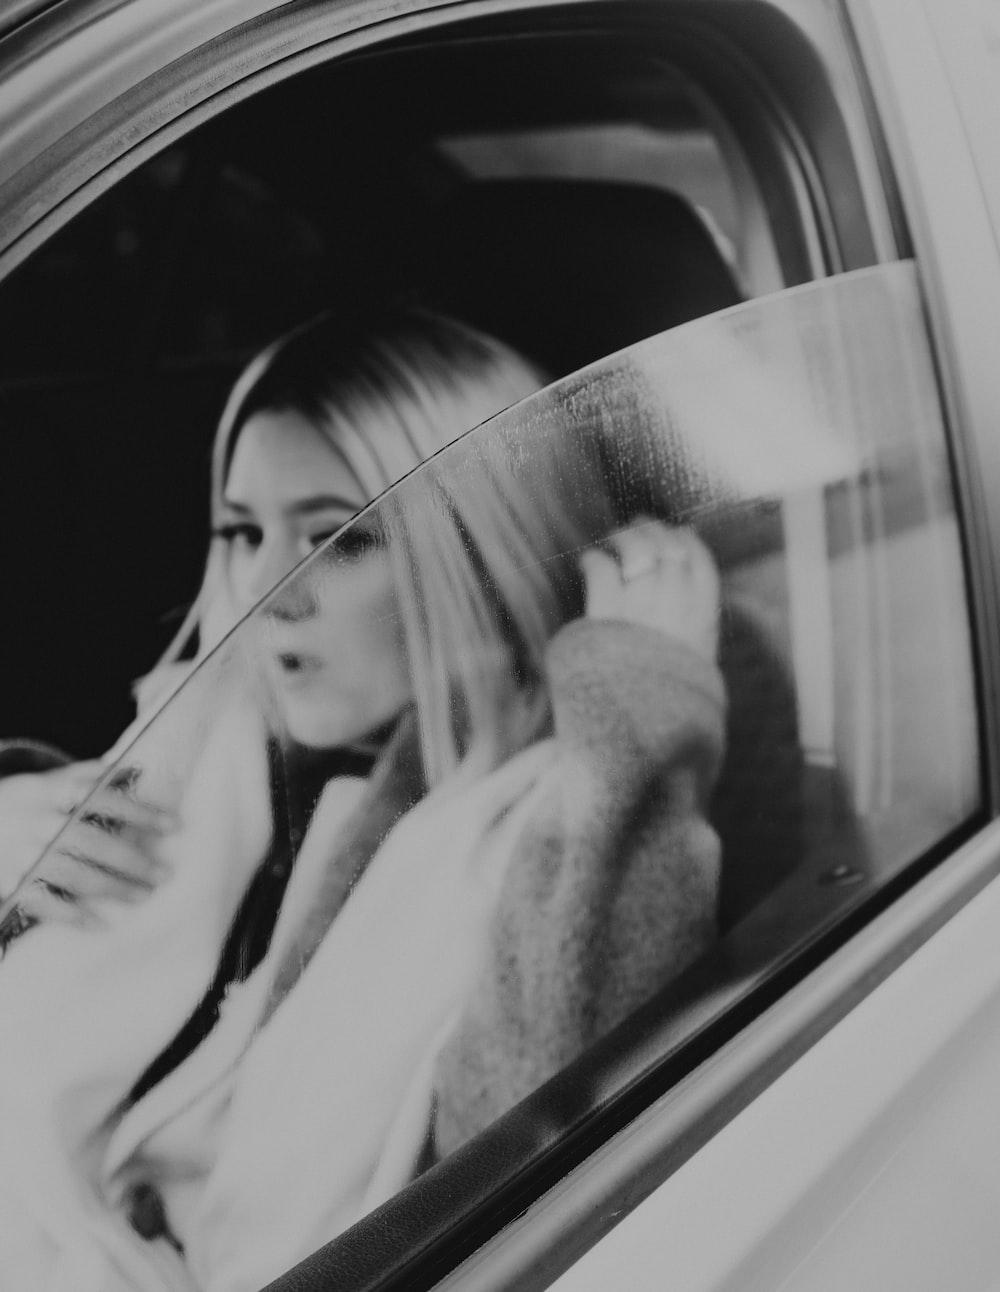 woman in white coat in car